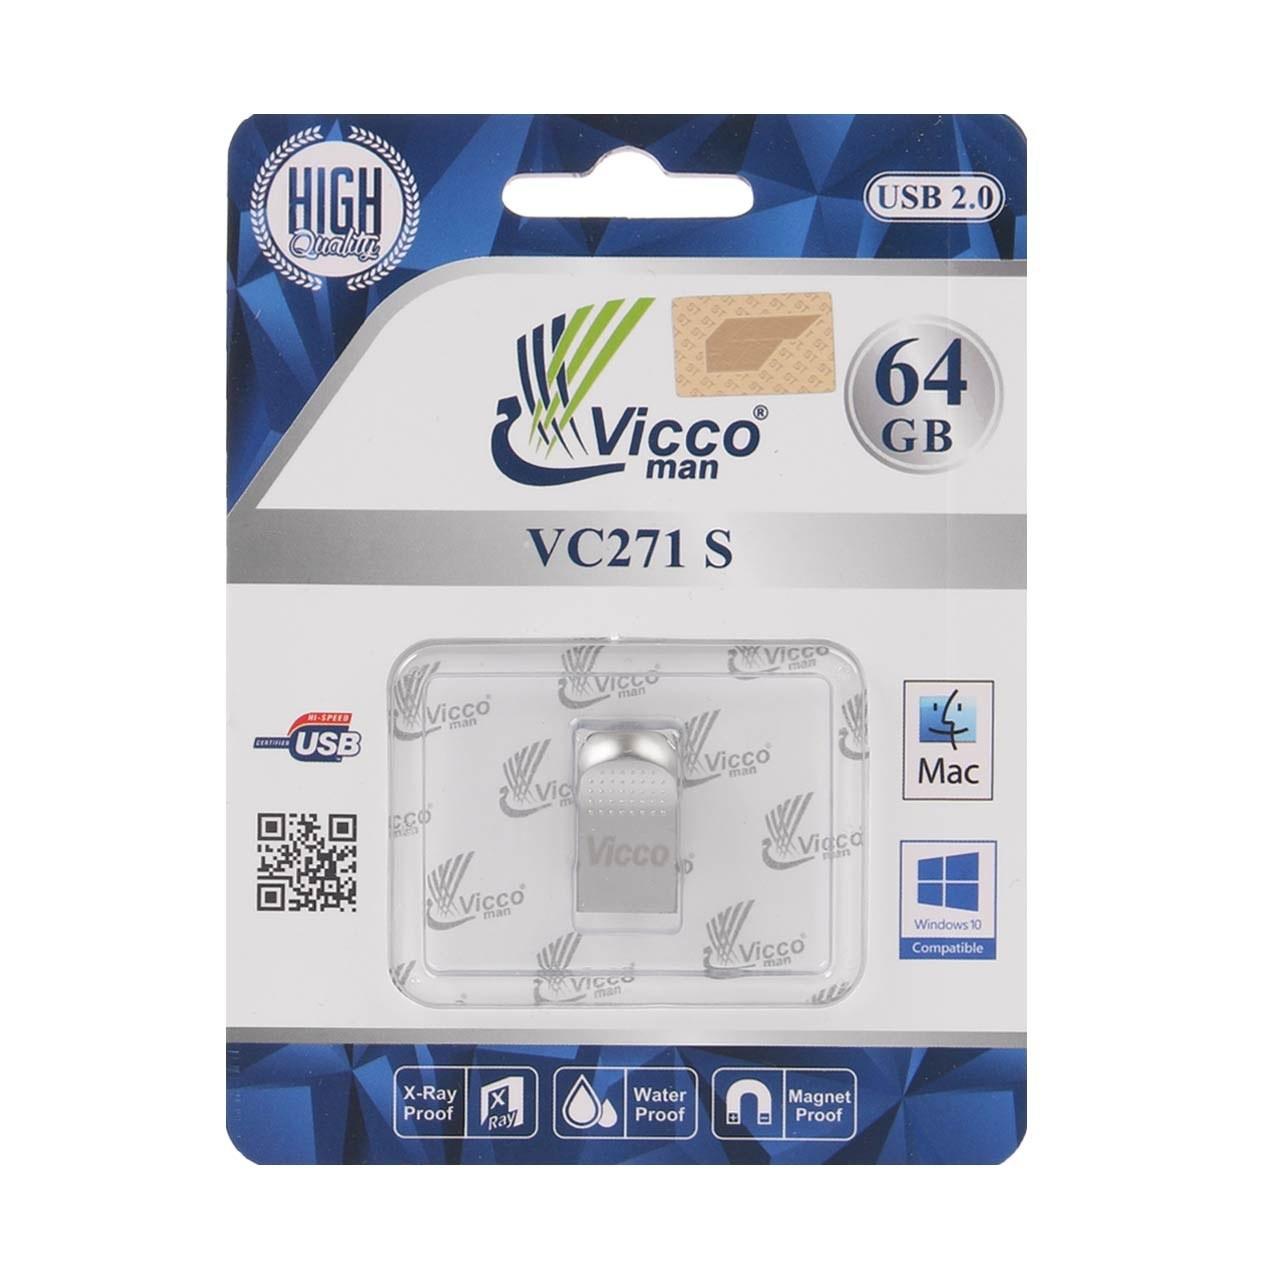 تصویر فلش مموری ویکومن Vicco man VC271s USB2.0 ظرفیت ۶۴گیگ